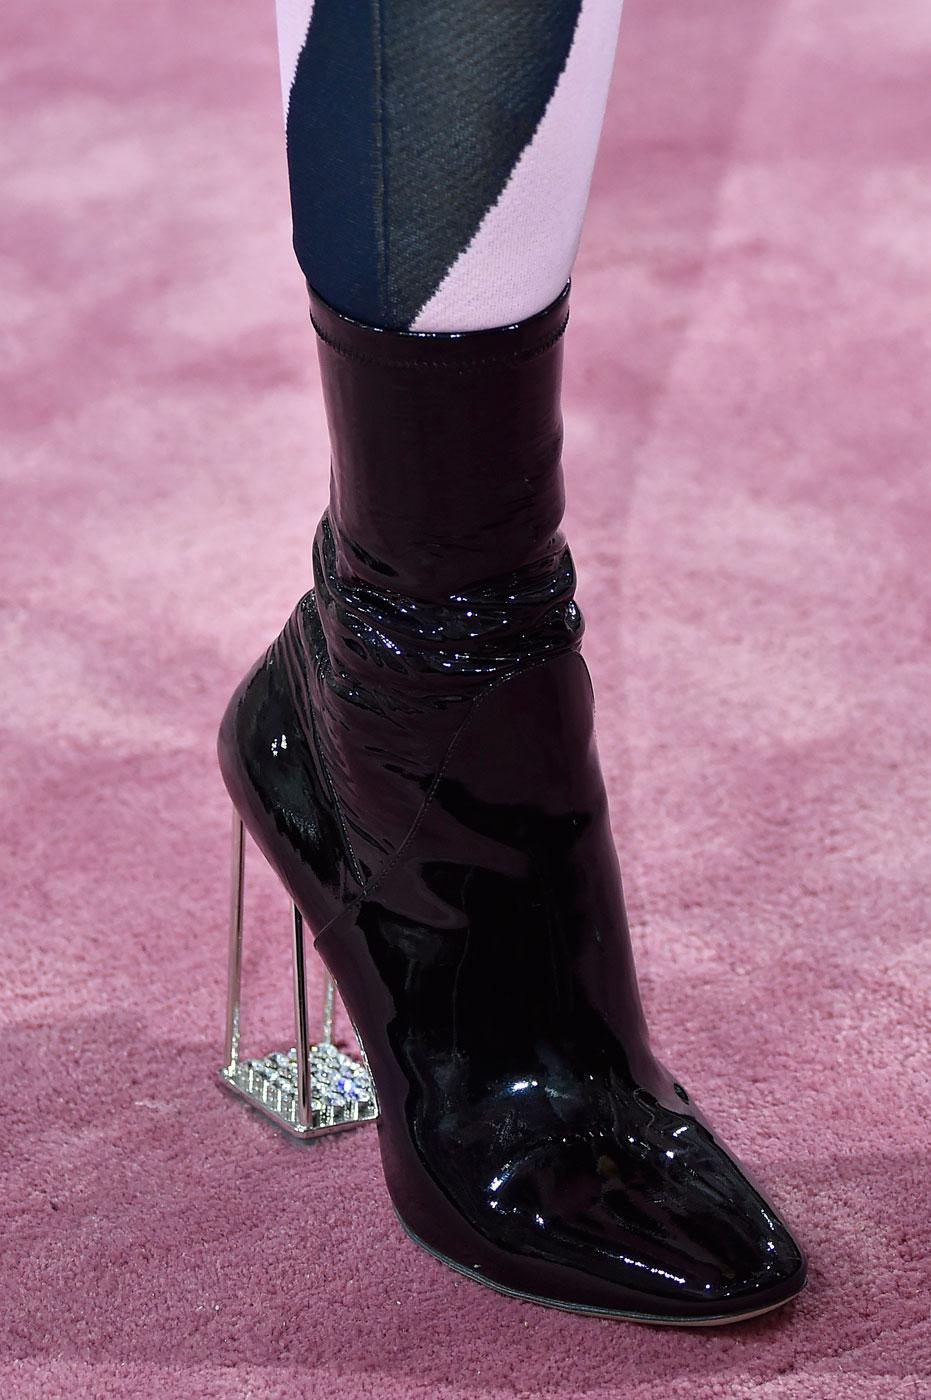 Christian-Dior-fashion-runway-show-close-ups-haute-couture-paris-spring-summer-2015-the-impression-048